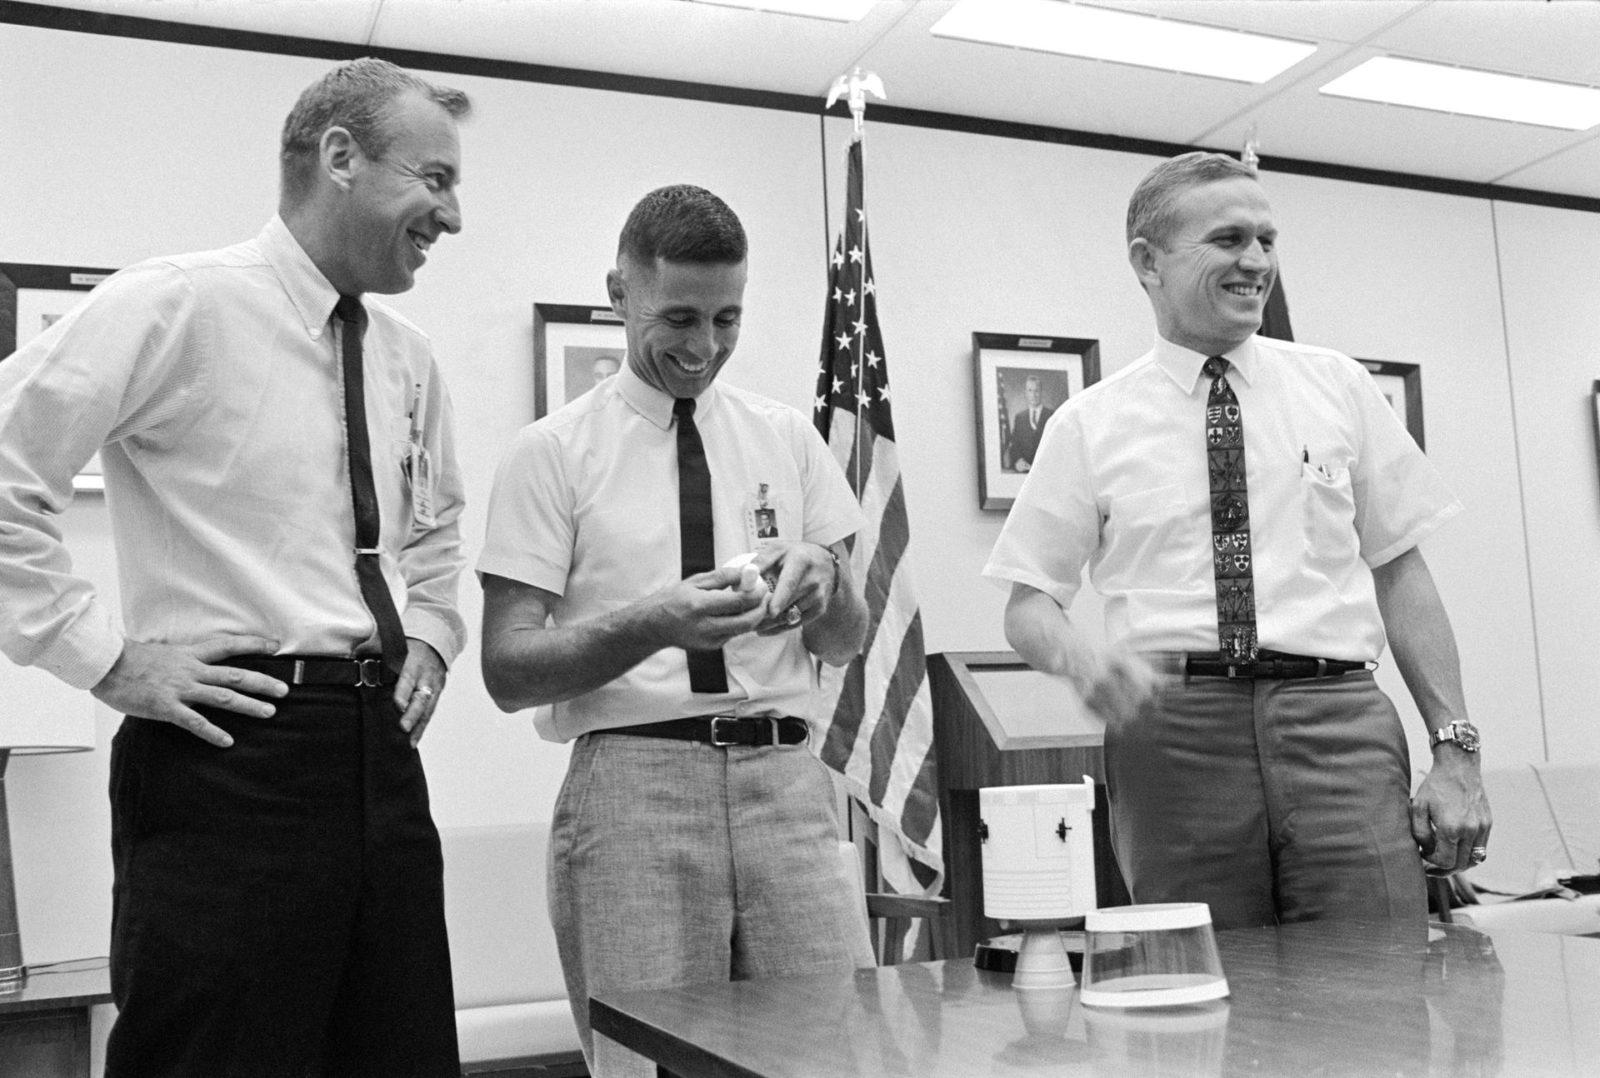 Apollo 8 prime crew in bldg 4 participating in classroom work